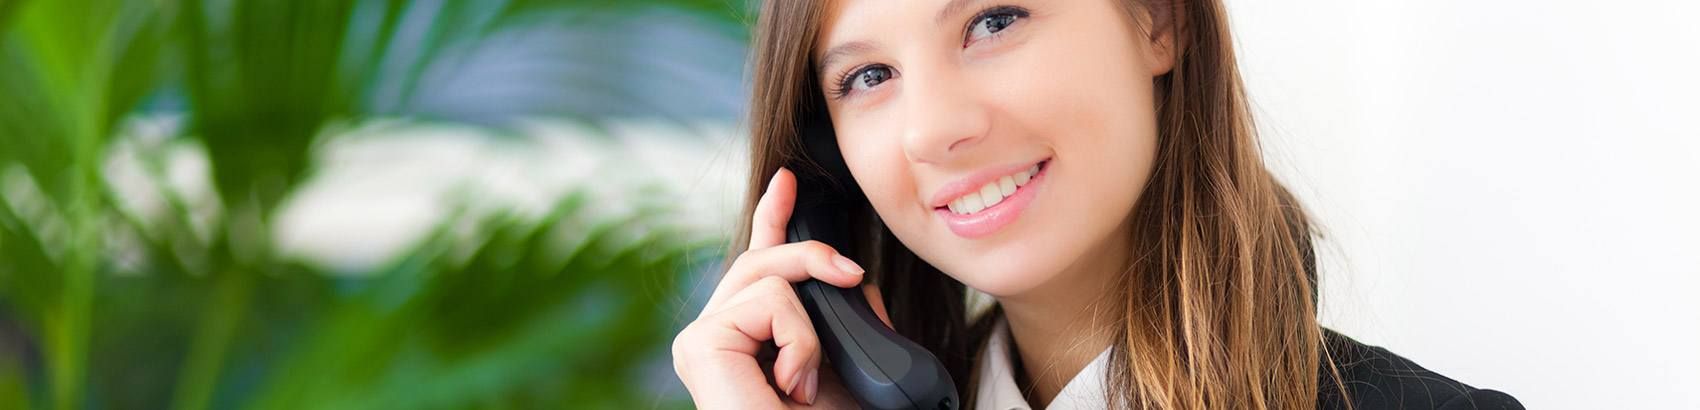 Contact Asuncion Dental Group